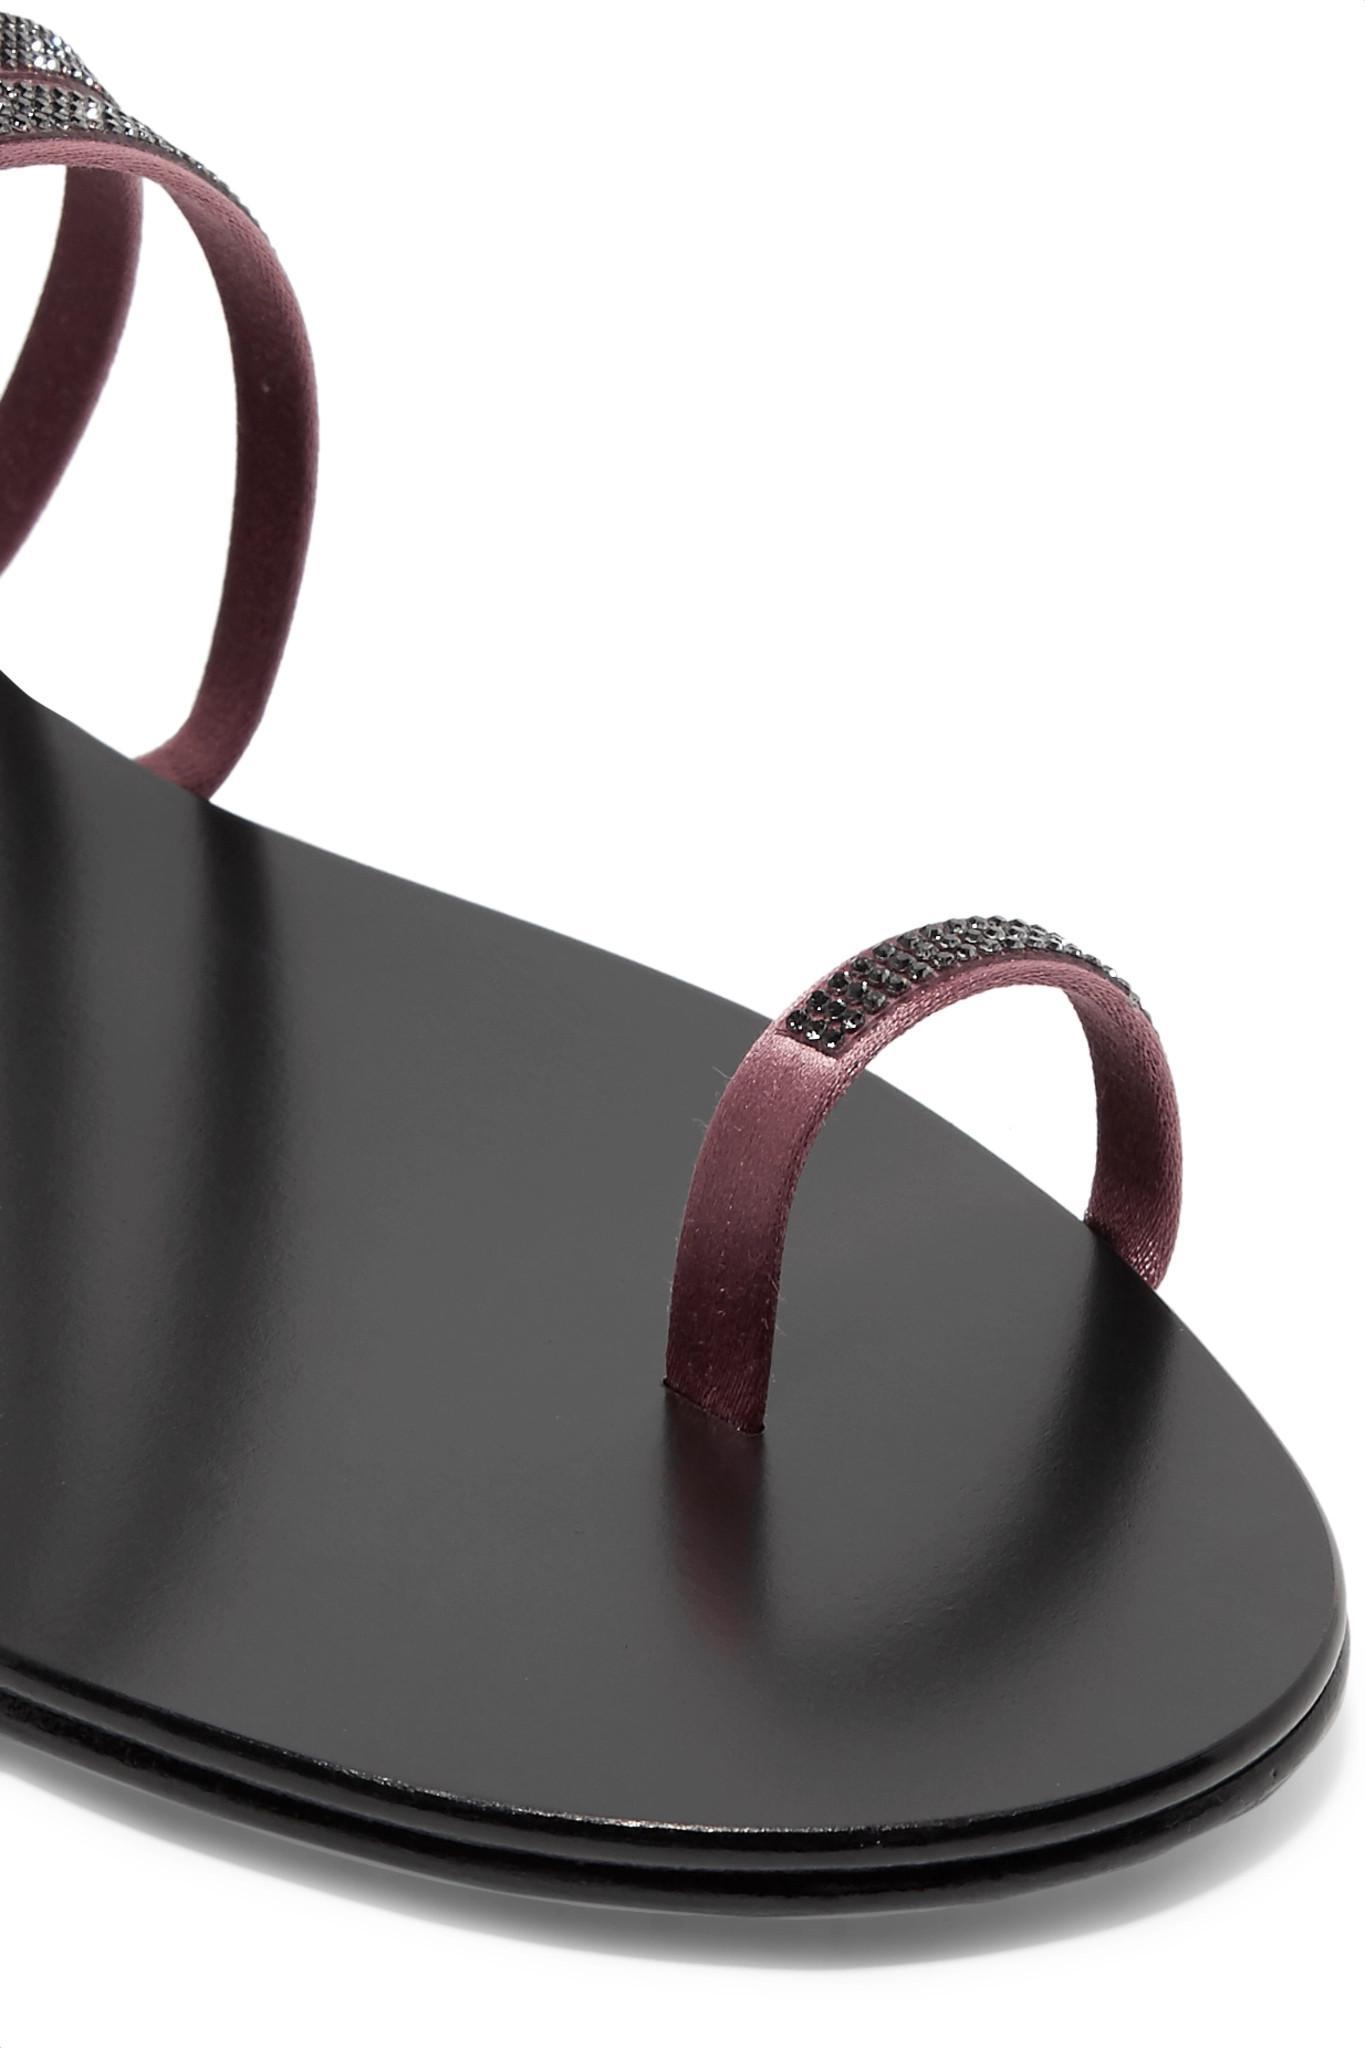 e75caa3085b4 Pedro Garcia - Black Sula Swarovski Crystal-embellished Satin And Leather  Sandals - Lyst. View fullscreen